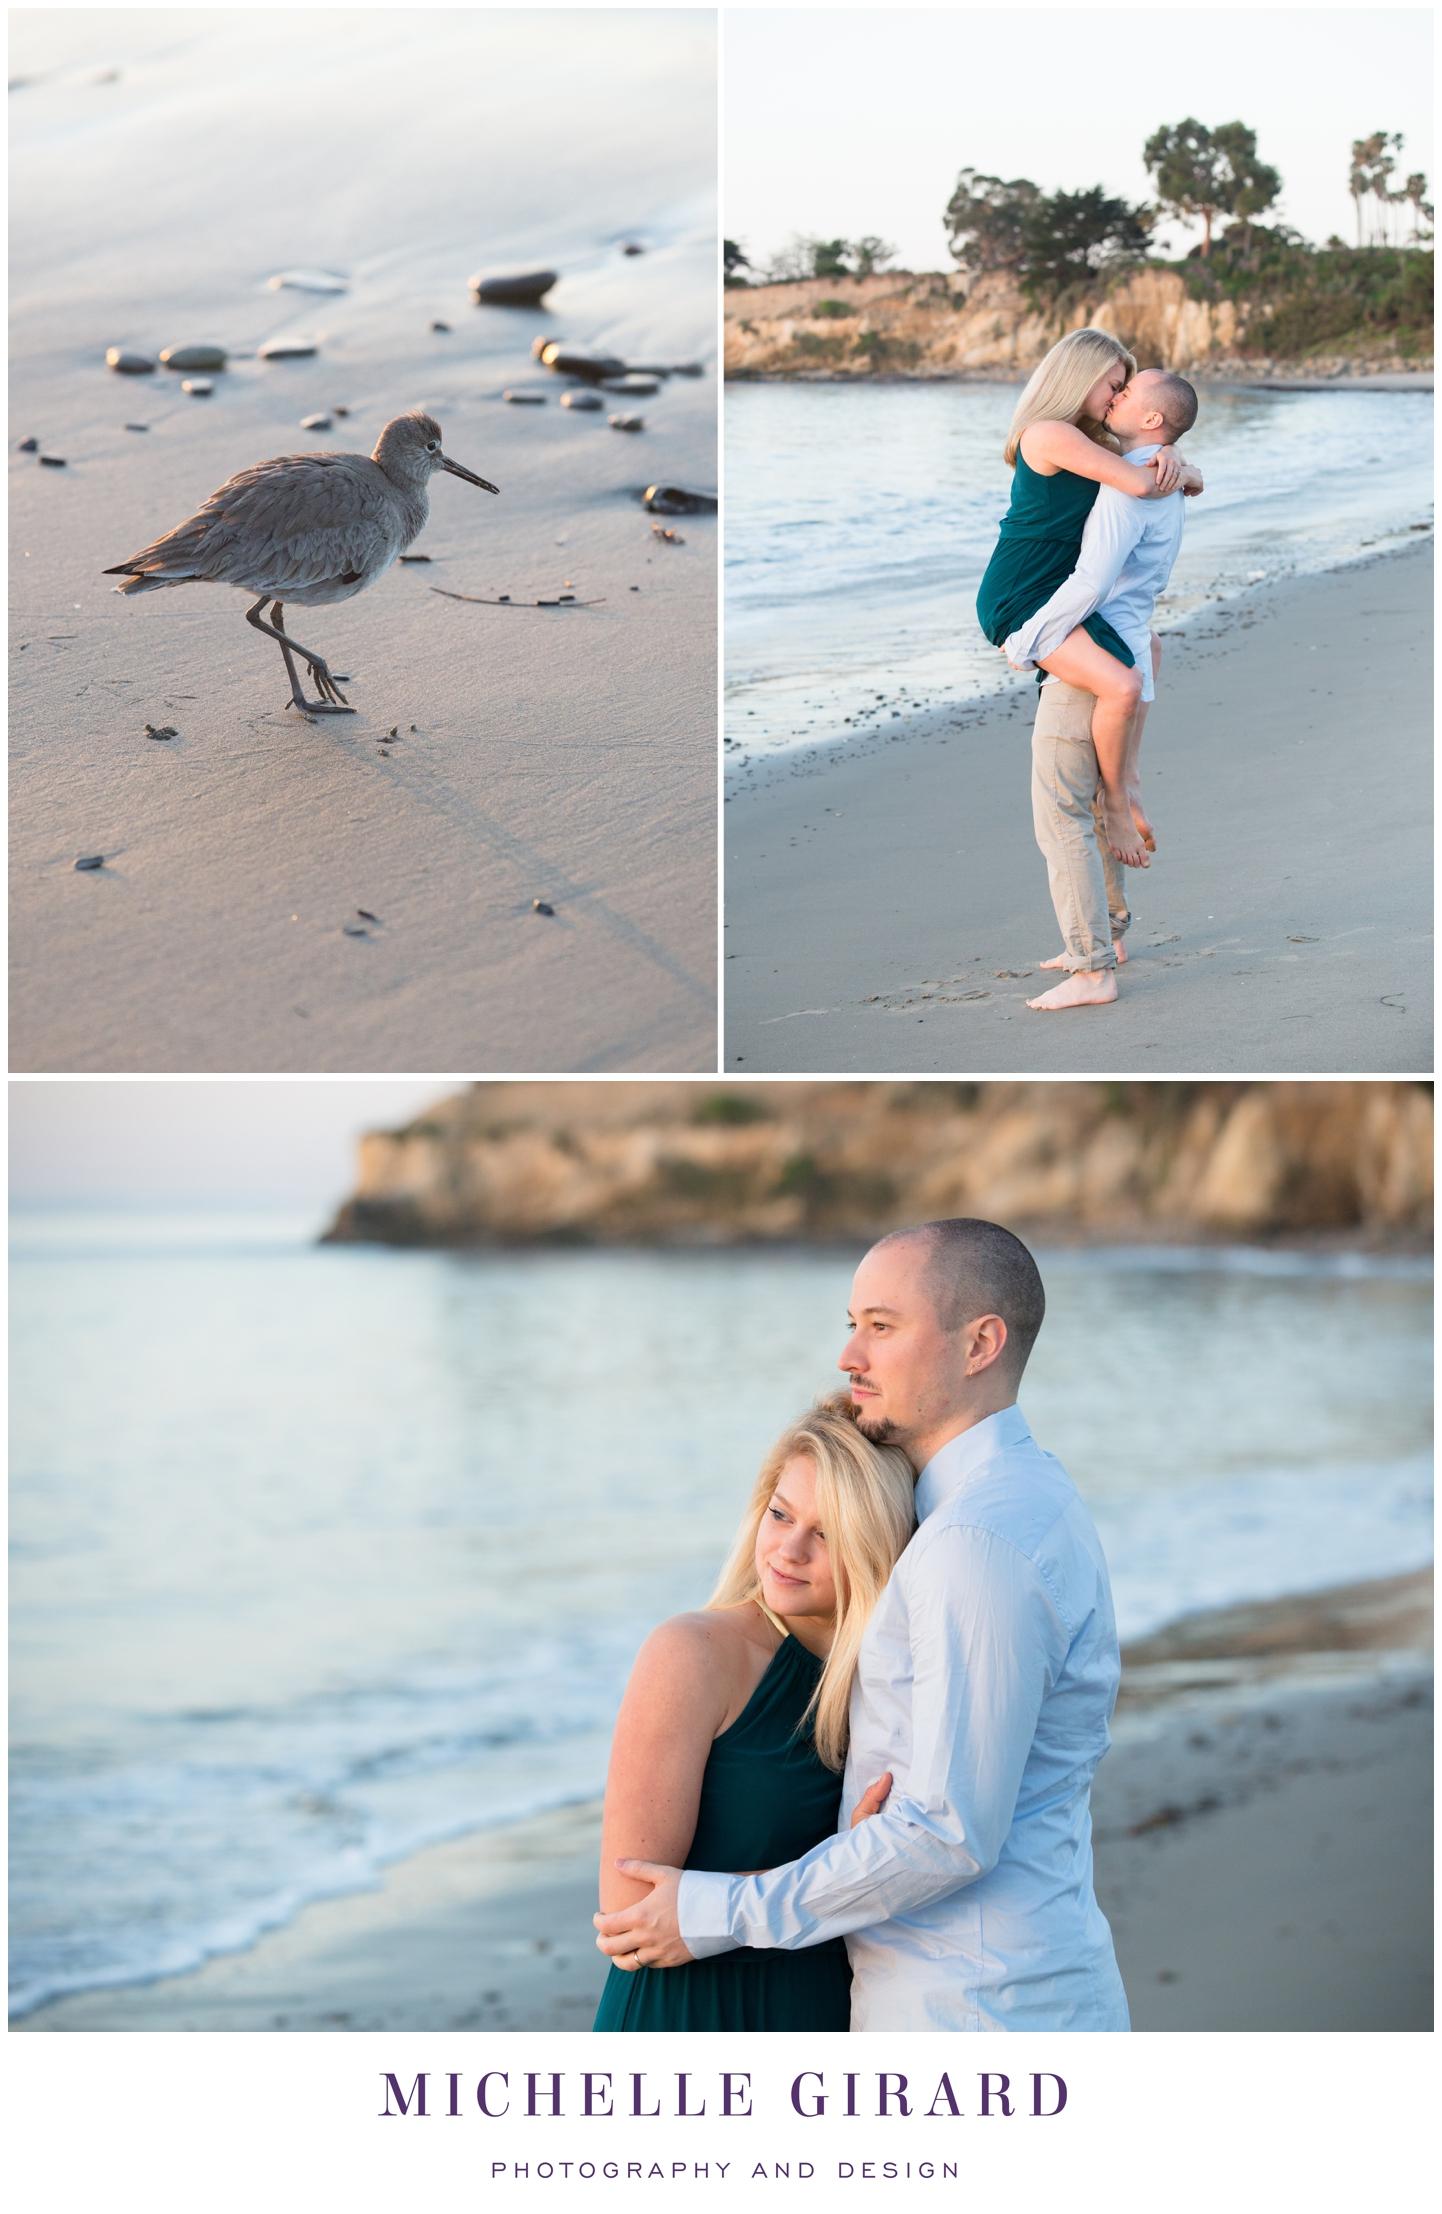 santa-barbara-california-engagement-photography-sunrise-theater-beach-michelle-girard08.jpg